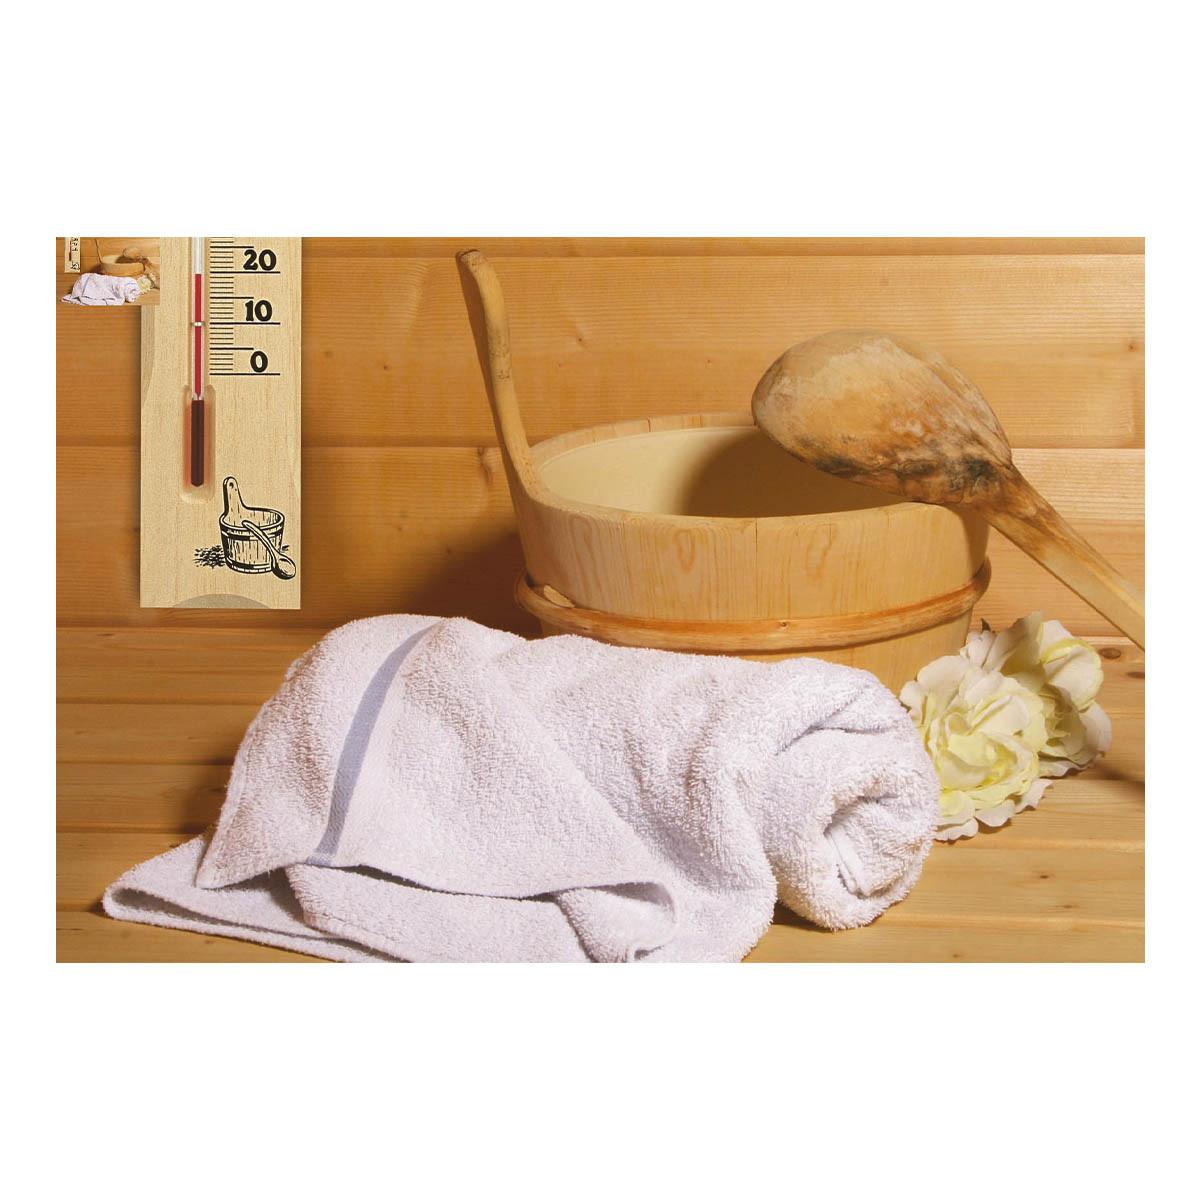 40-1000-analoges-sauna-thermometer-kiefer-anwendung-1200x1200px.jpg